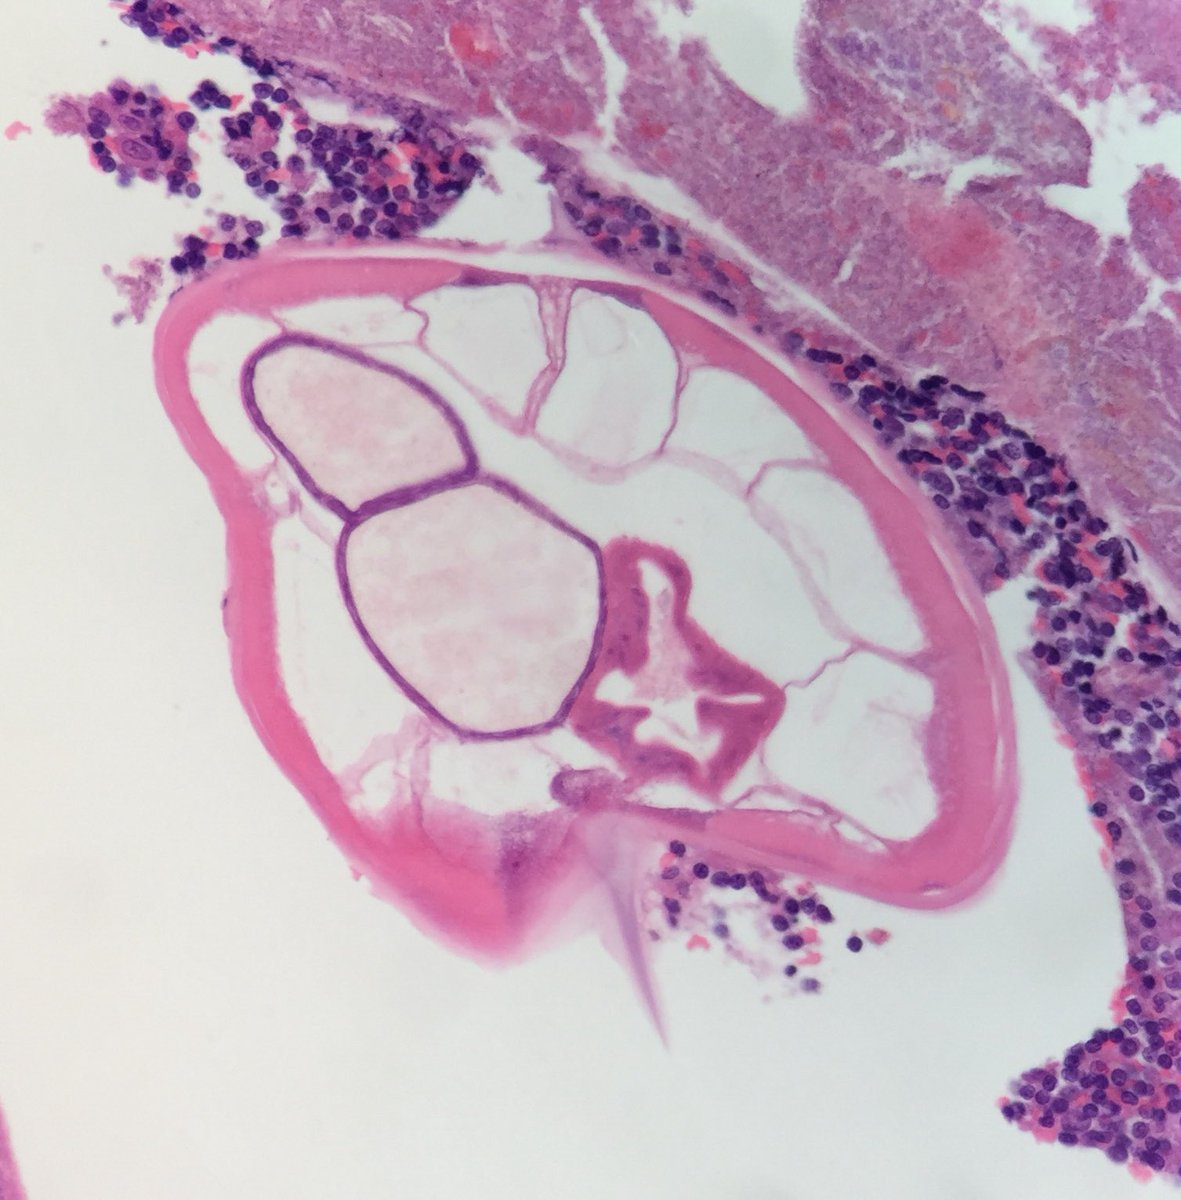 enterobius vermicularis appendix histology